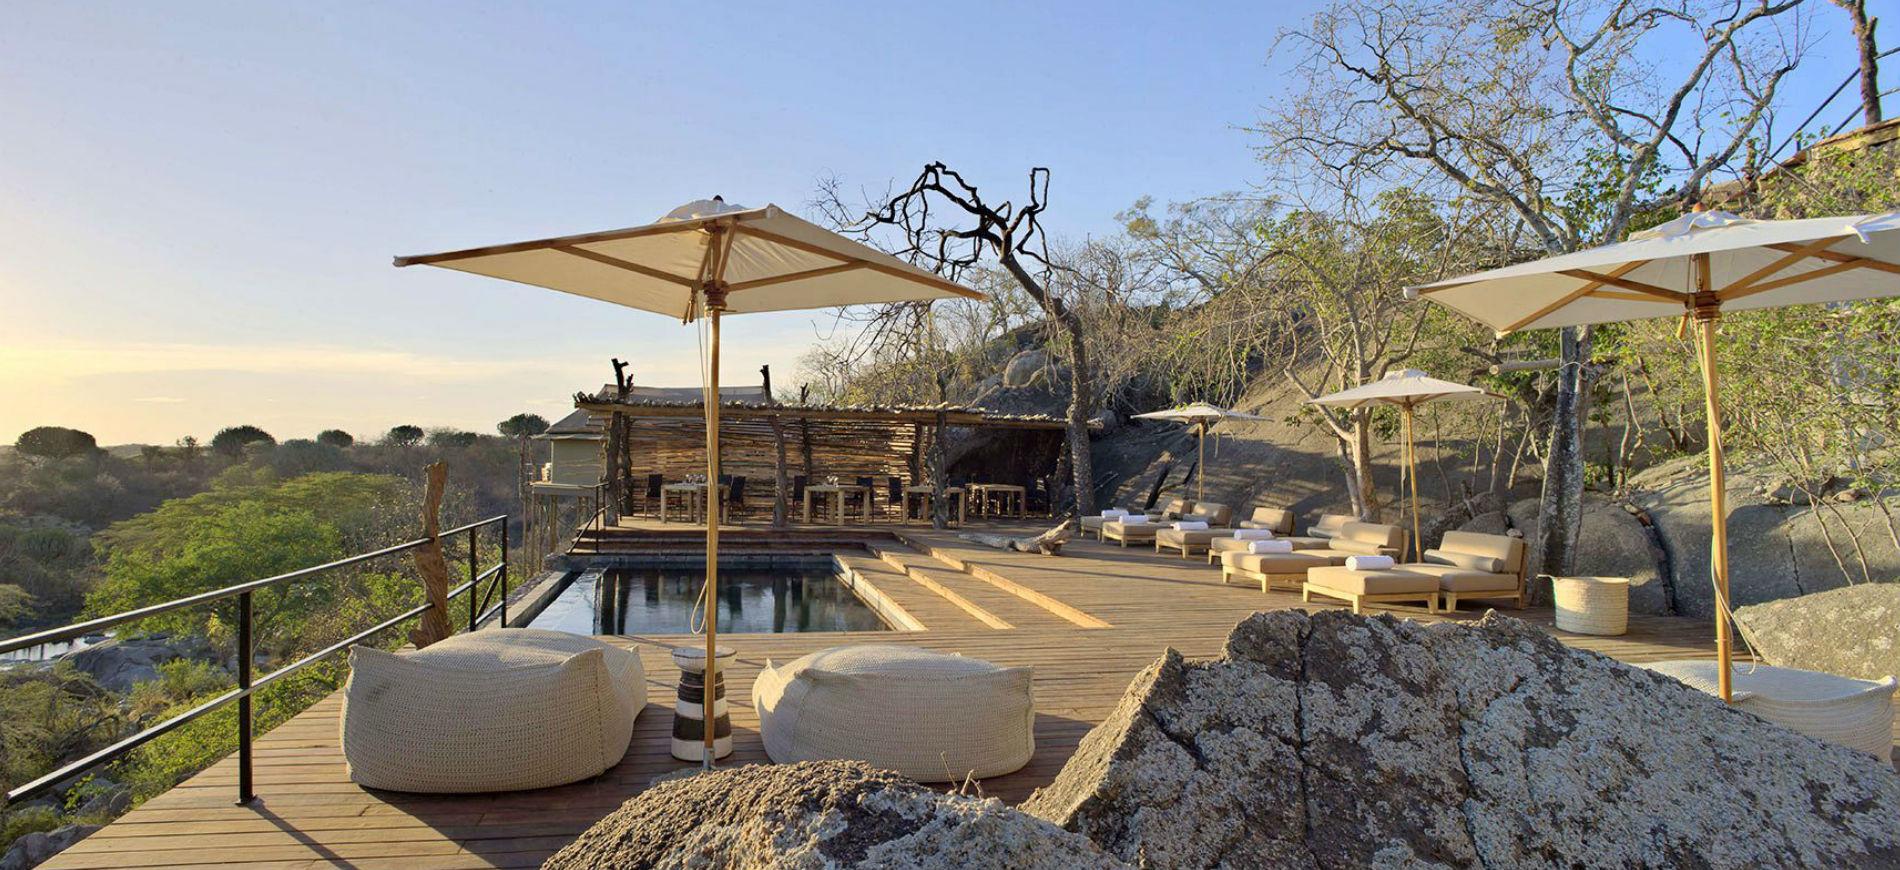 Tanzania - Mwiba Lodge Hotel: piscina esterna